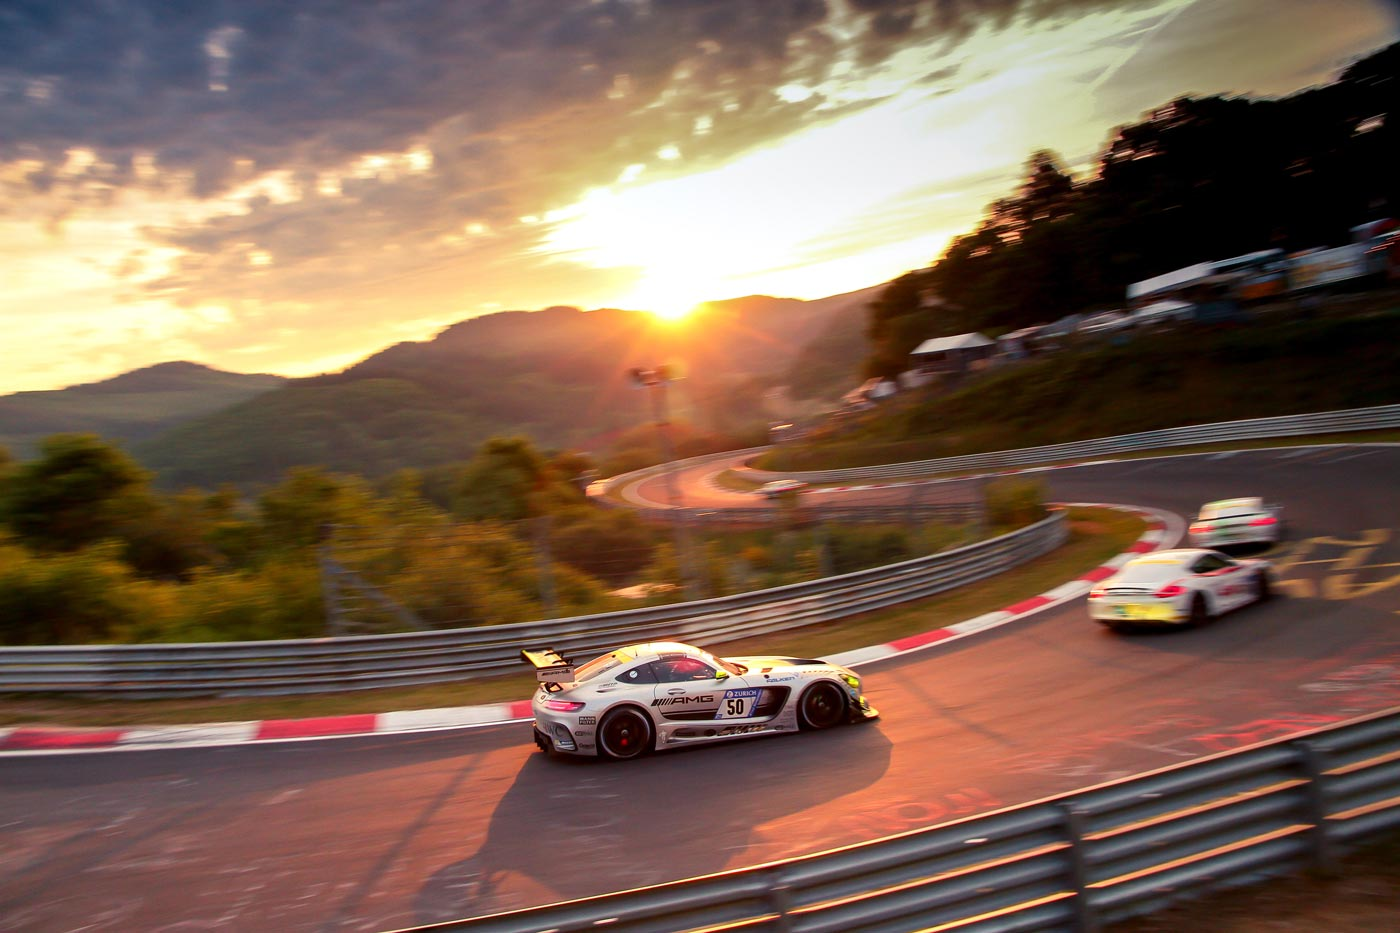 maximilian-buhk-24h-Rennen-2017_Mercedes-AMG-01